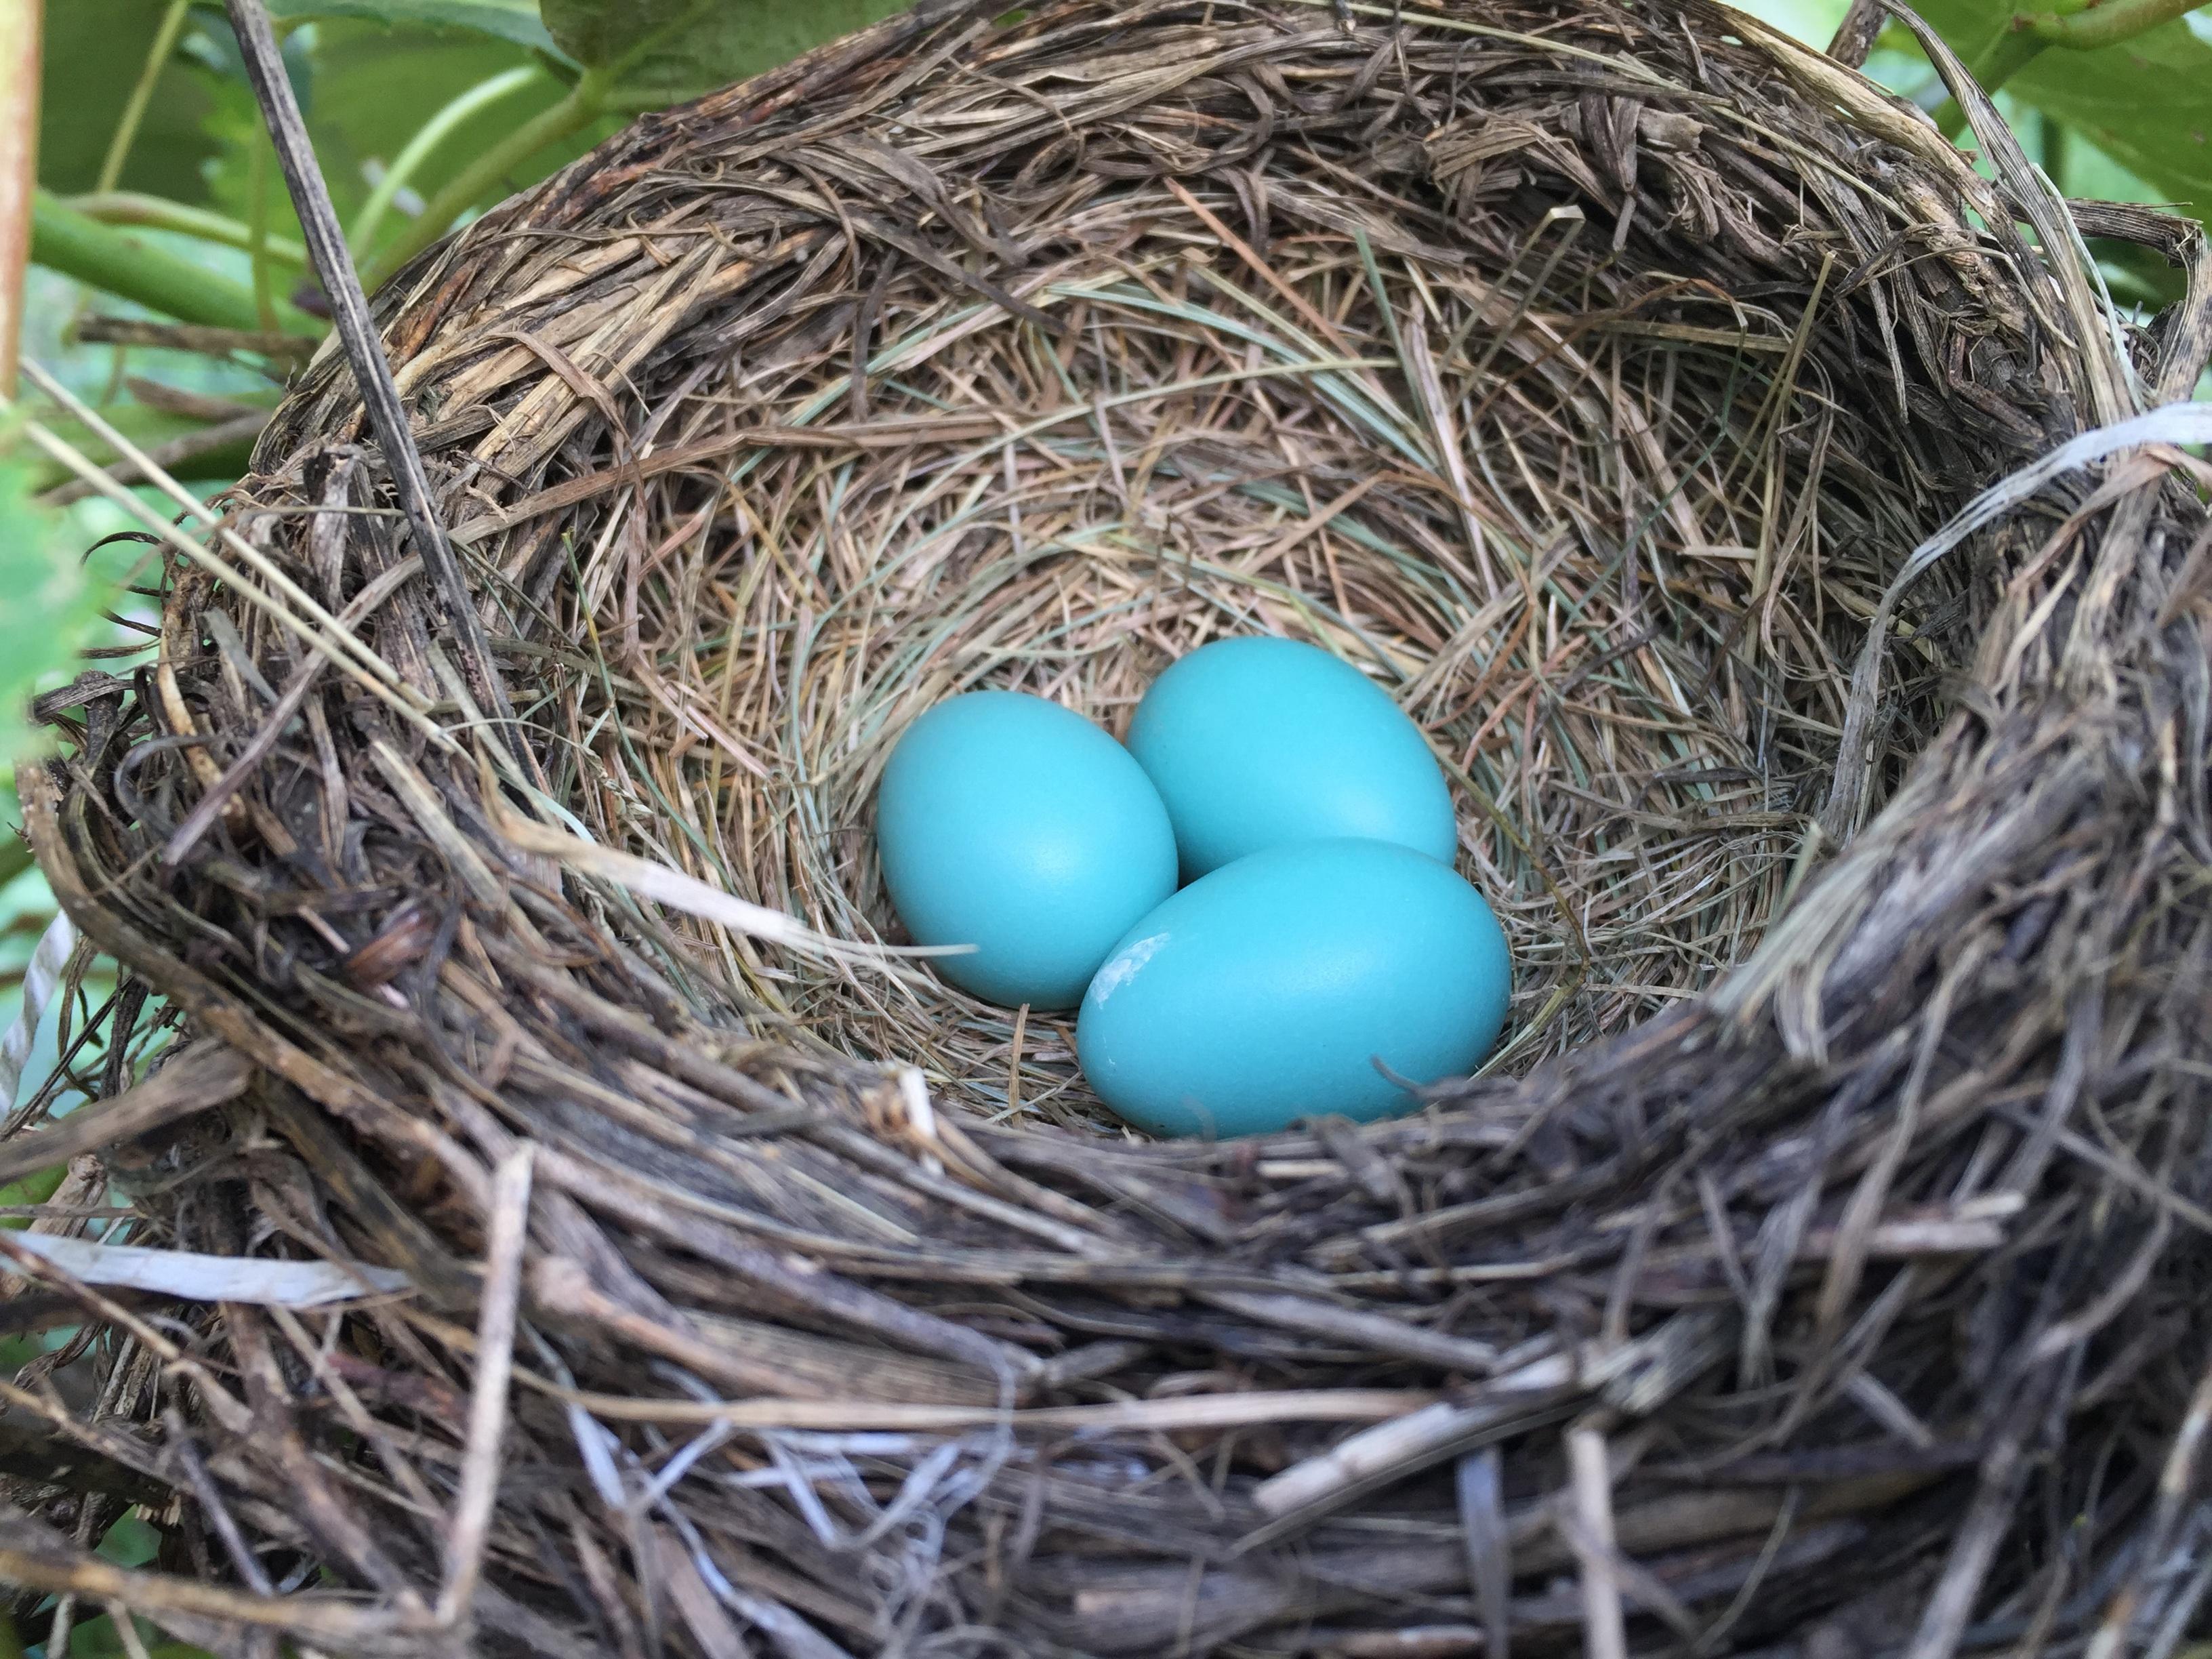 Fotos Gratis Rama Pájaro Pico Huevo Nido De Pájaro Azulejo